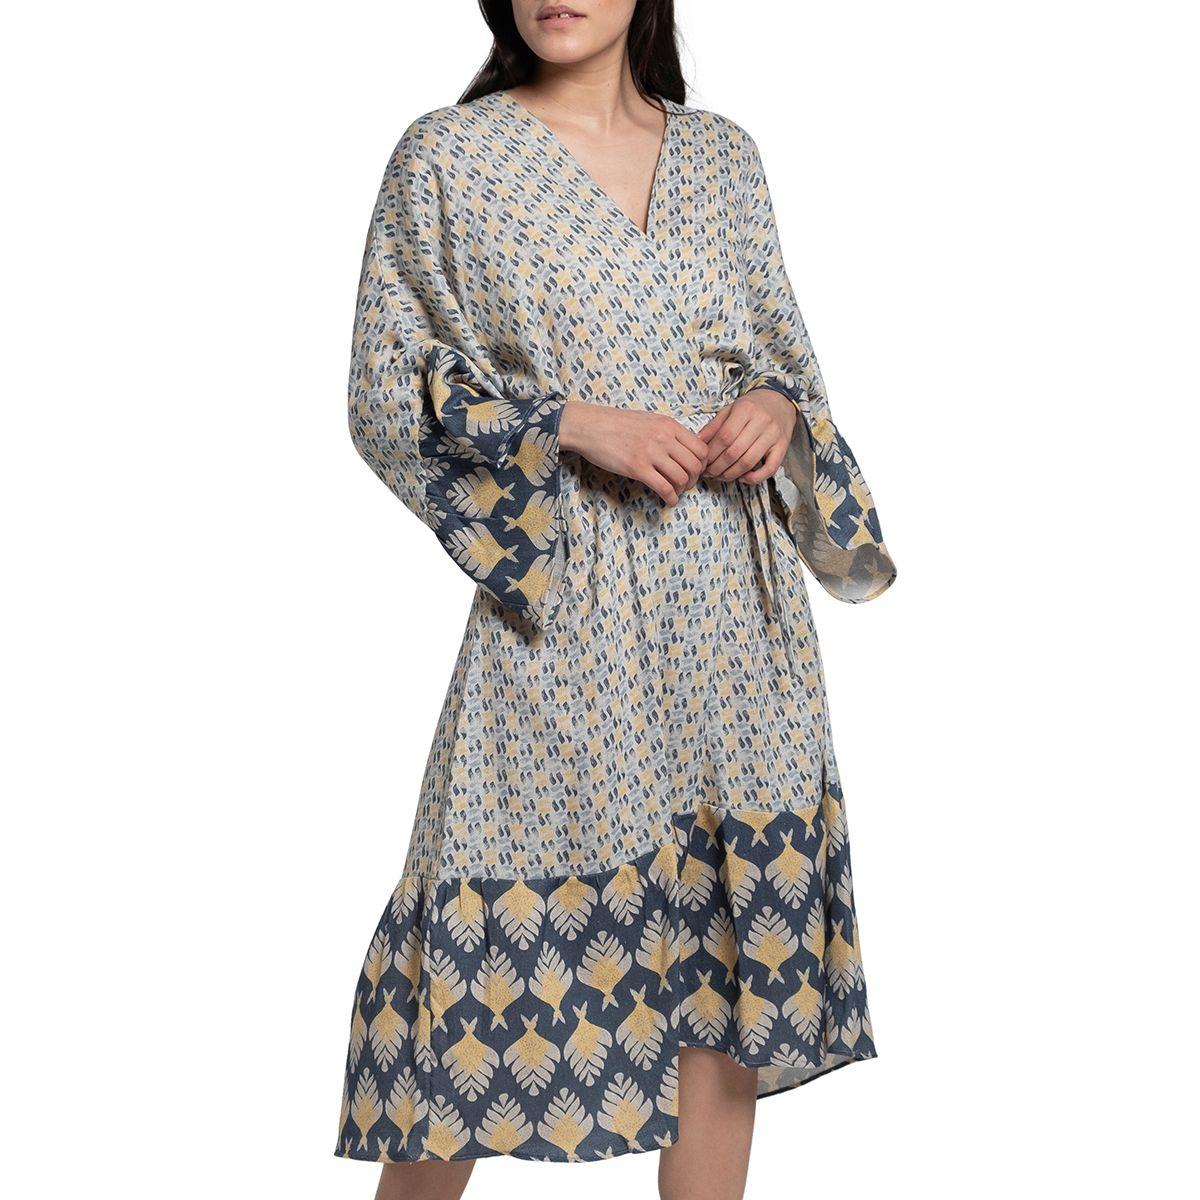 Dressing Gown / Home Wear - Santorini